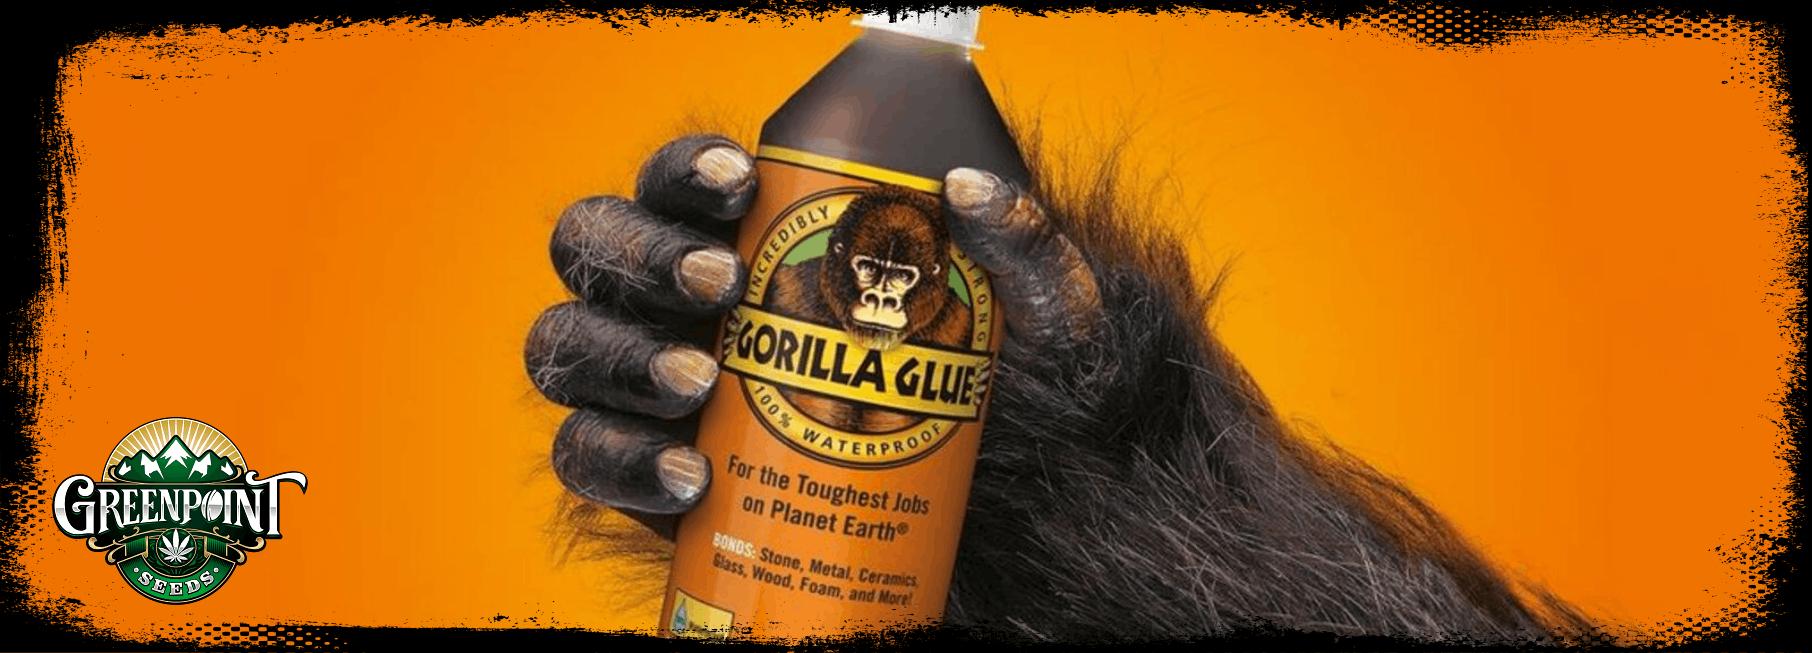 Gorilla Glue #4 - Greenpoint Seeds